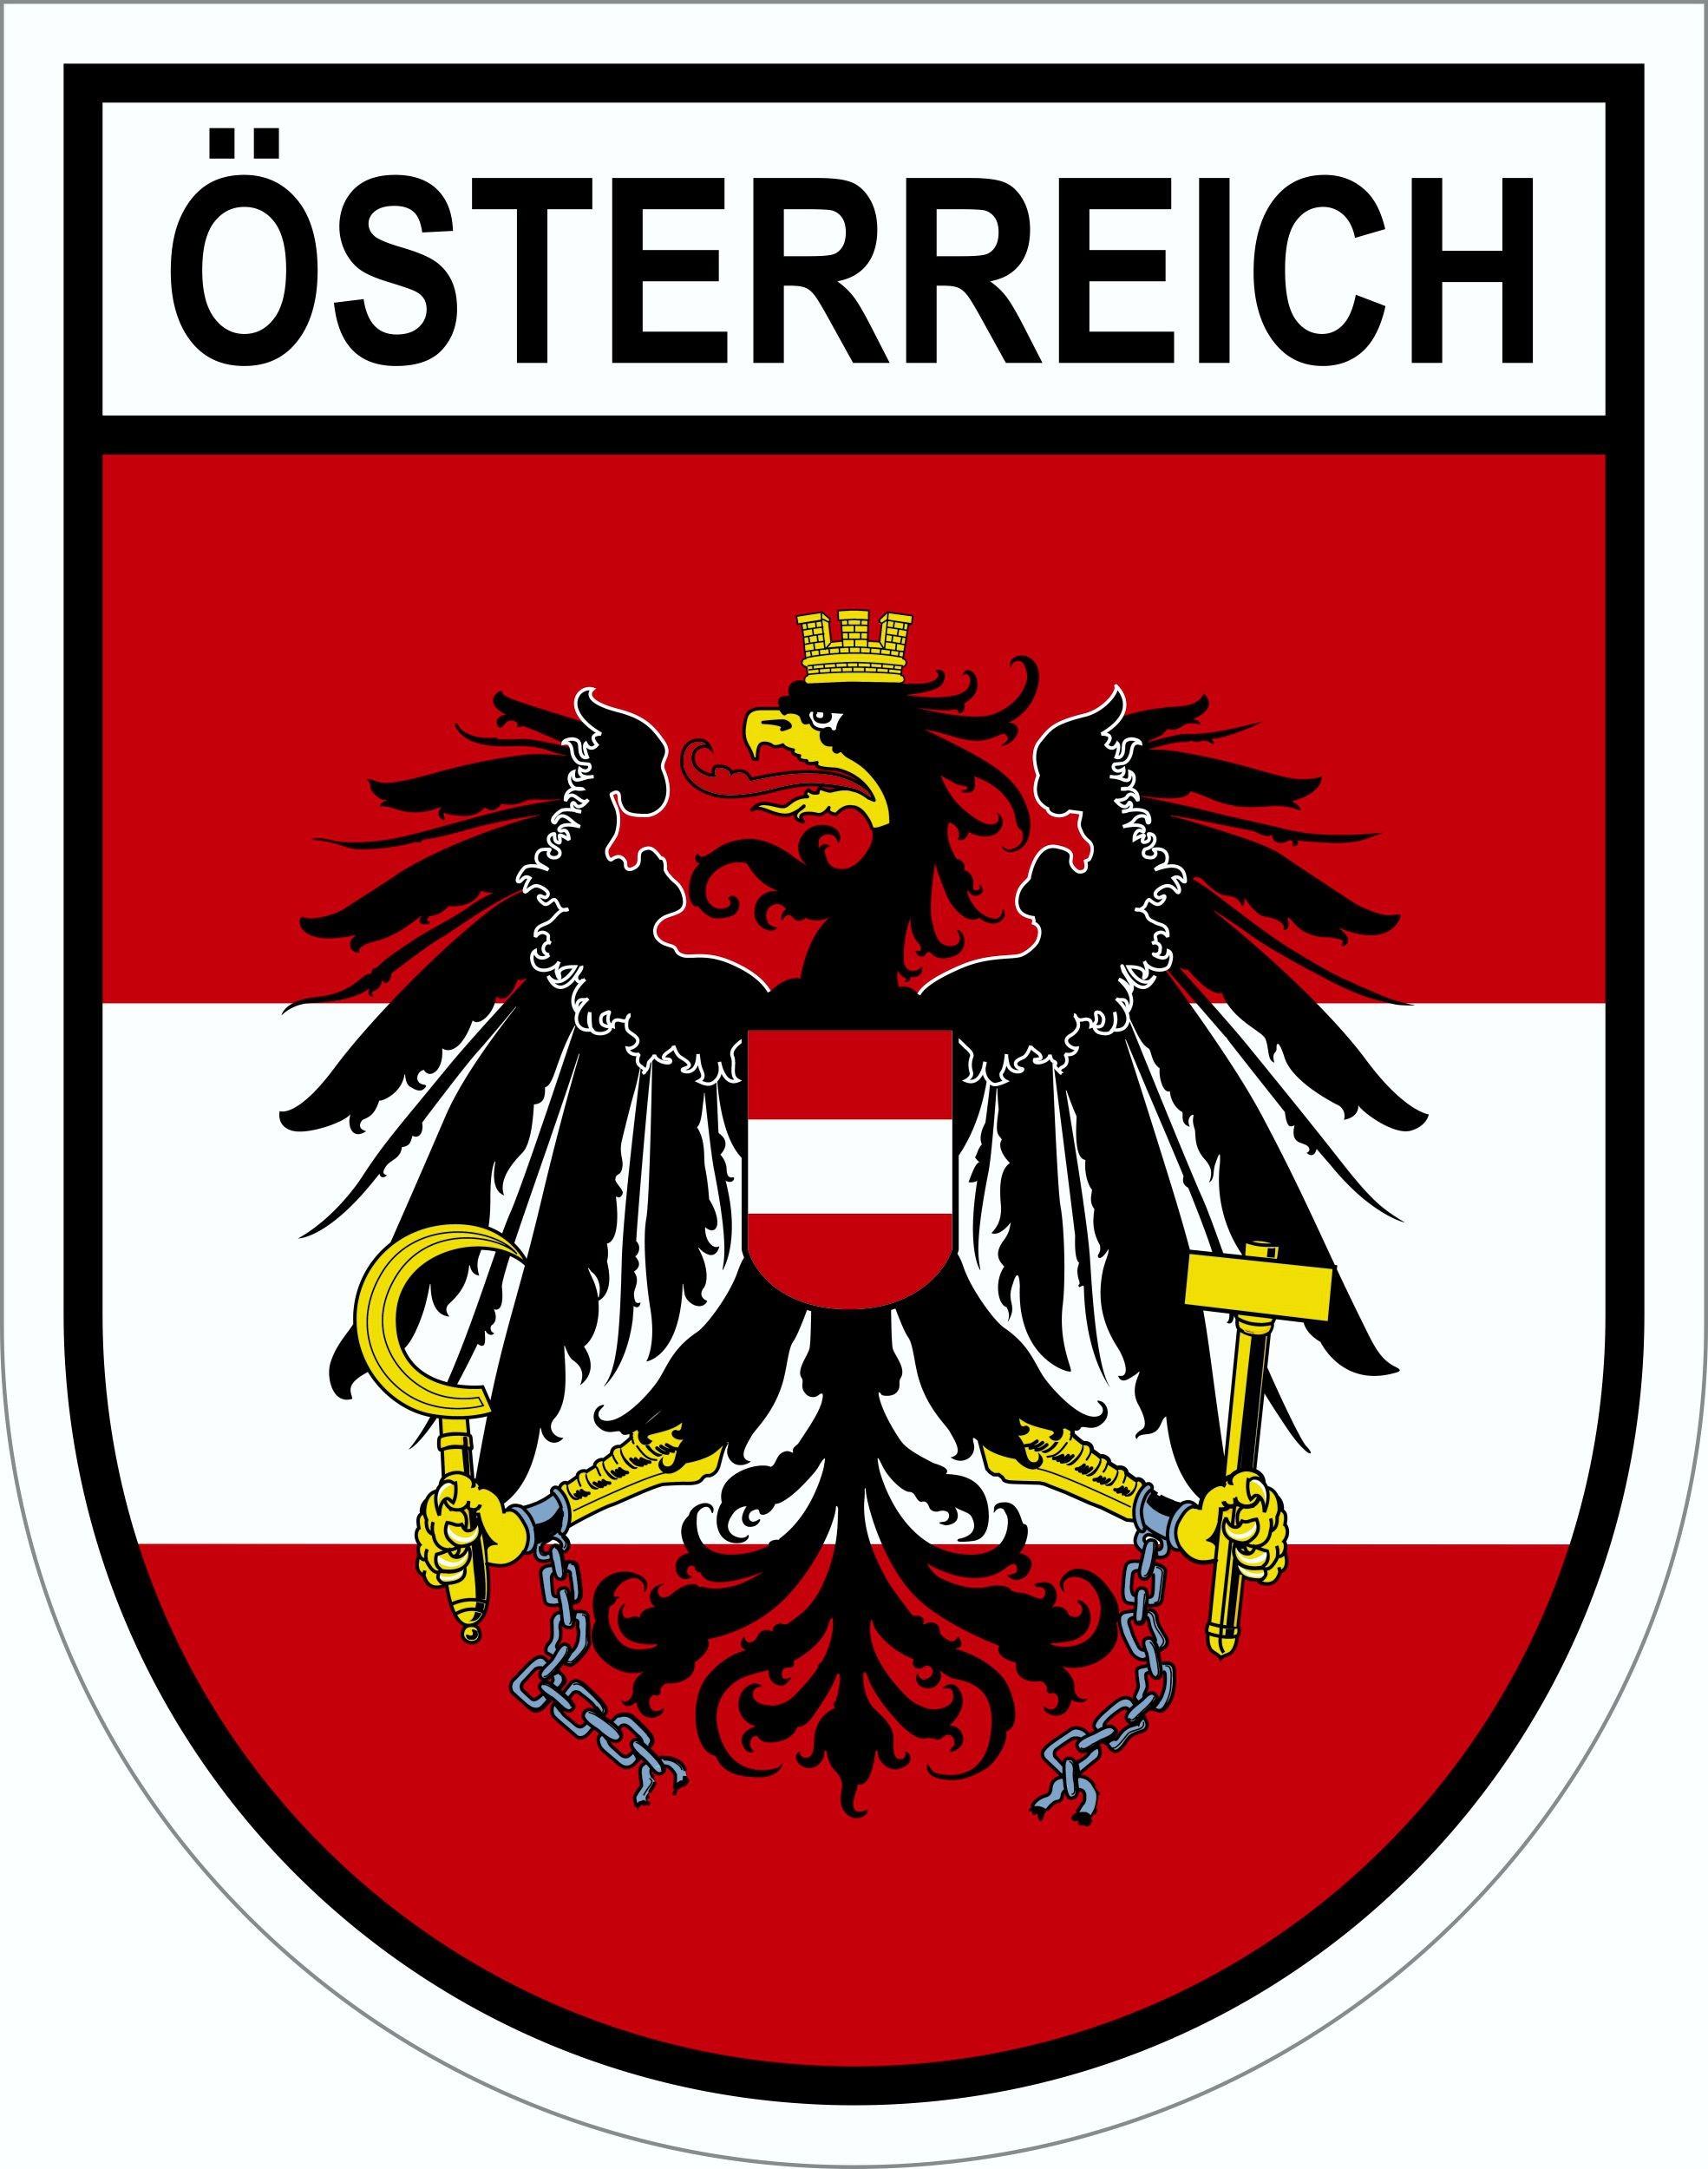 Adhesivo blasón Österreich 120 x 90  mm